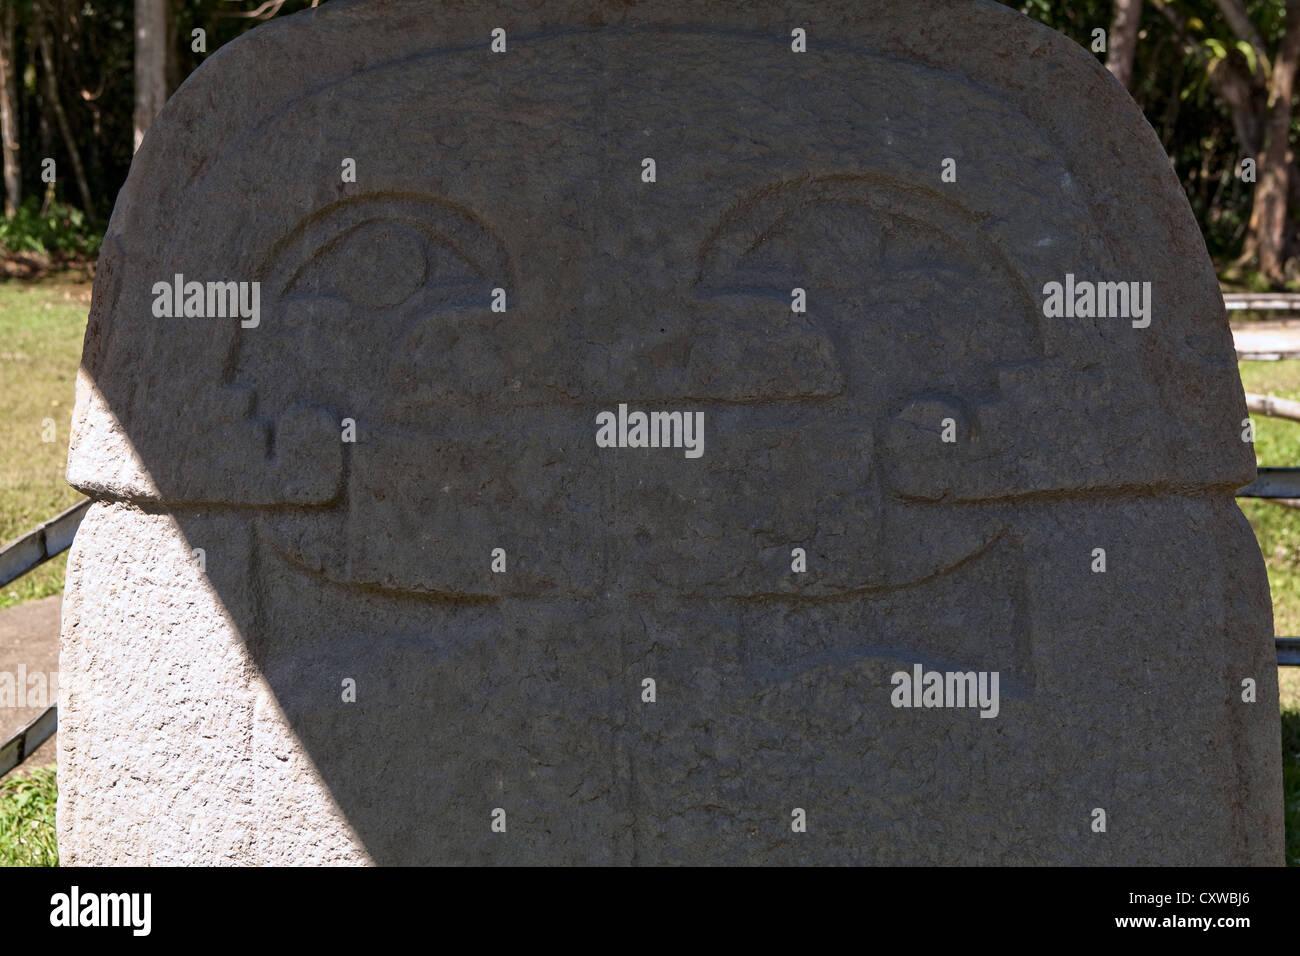 Máscara de águila en una cabeza humana Sitio Arqueológico San Agustín Colombia Imagen De Stock